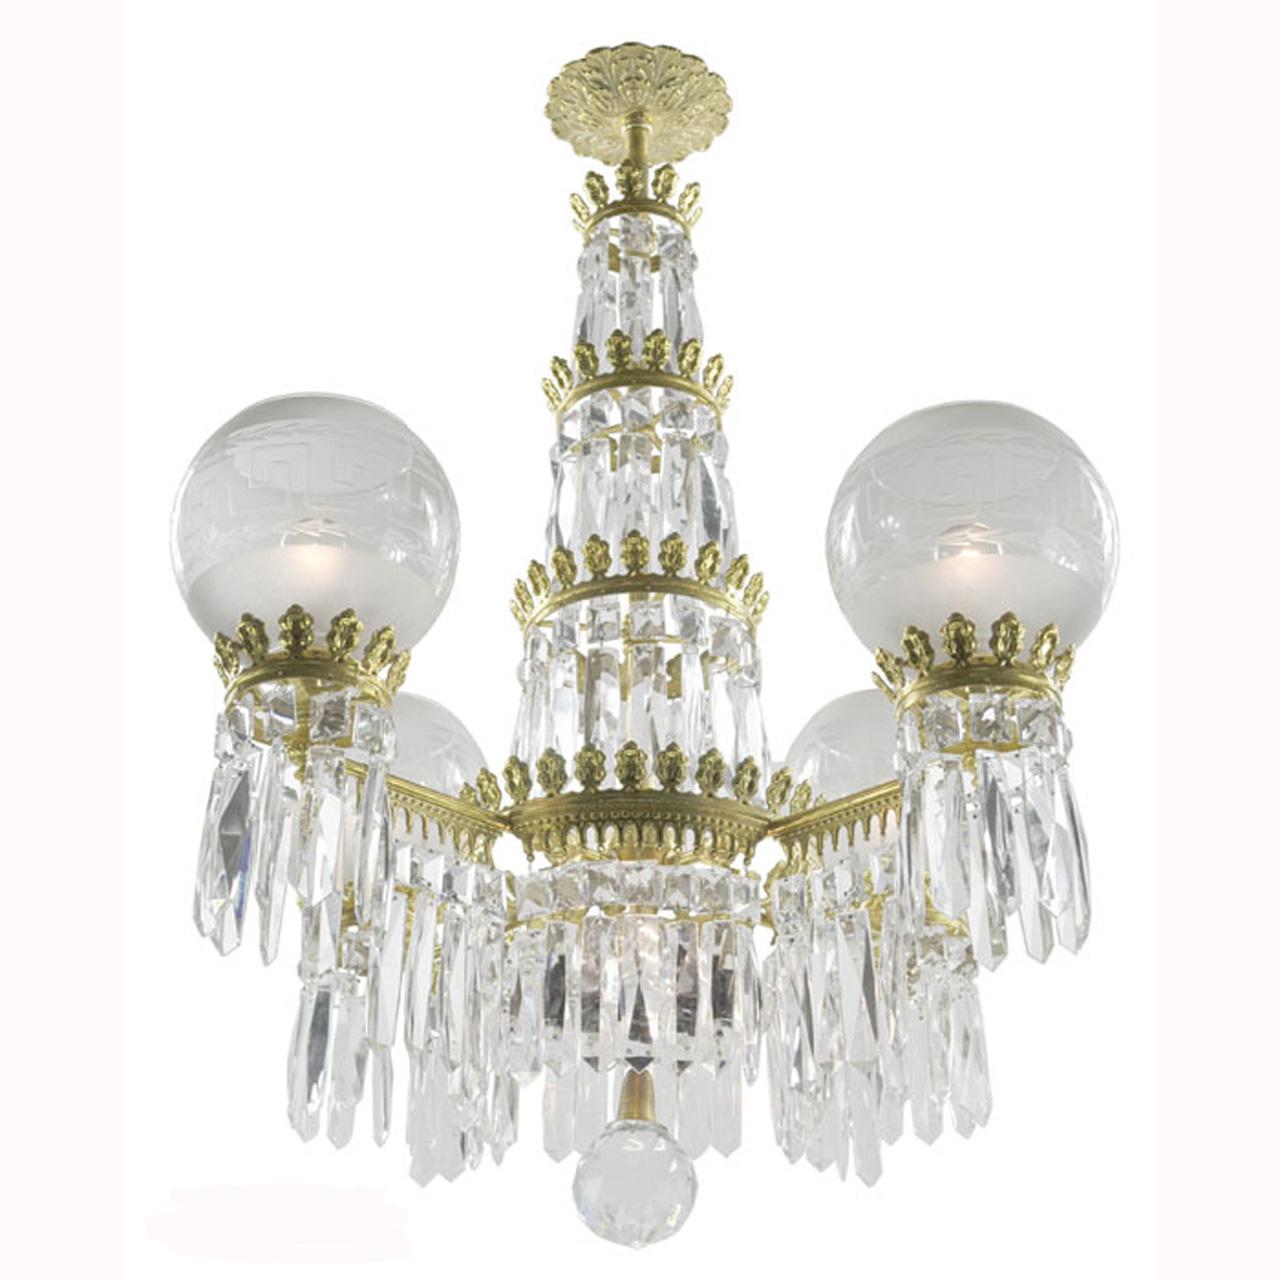 Antique Original Crystal Gasolier Style Ceiling Chandelier Lighting  (ANT-391) - For Sale - Antique Original Crystal Gasolier Style Ceiling Chandelier Lighting